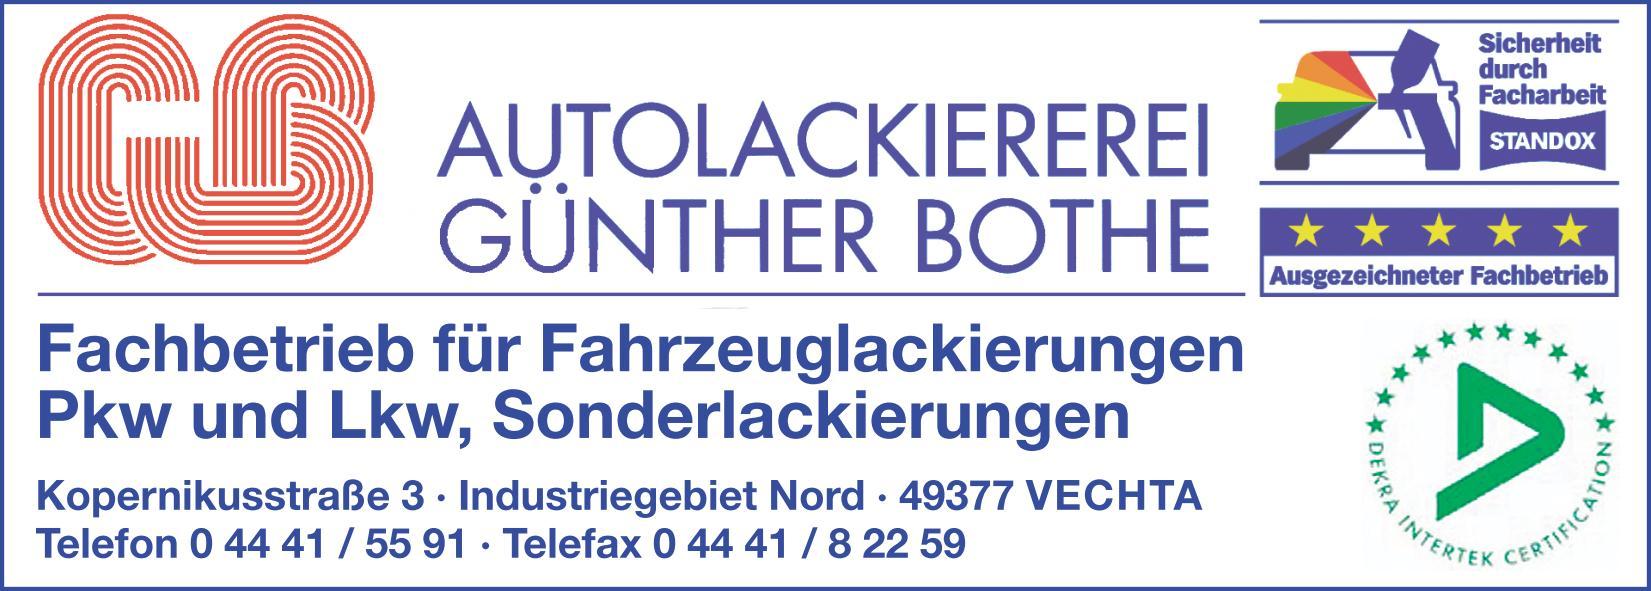 lackierer-bothe